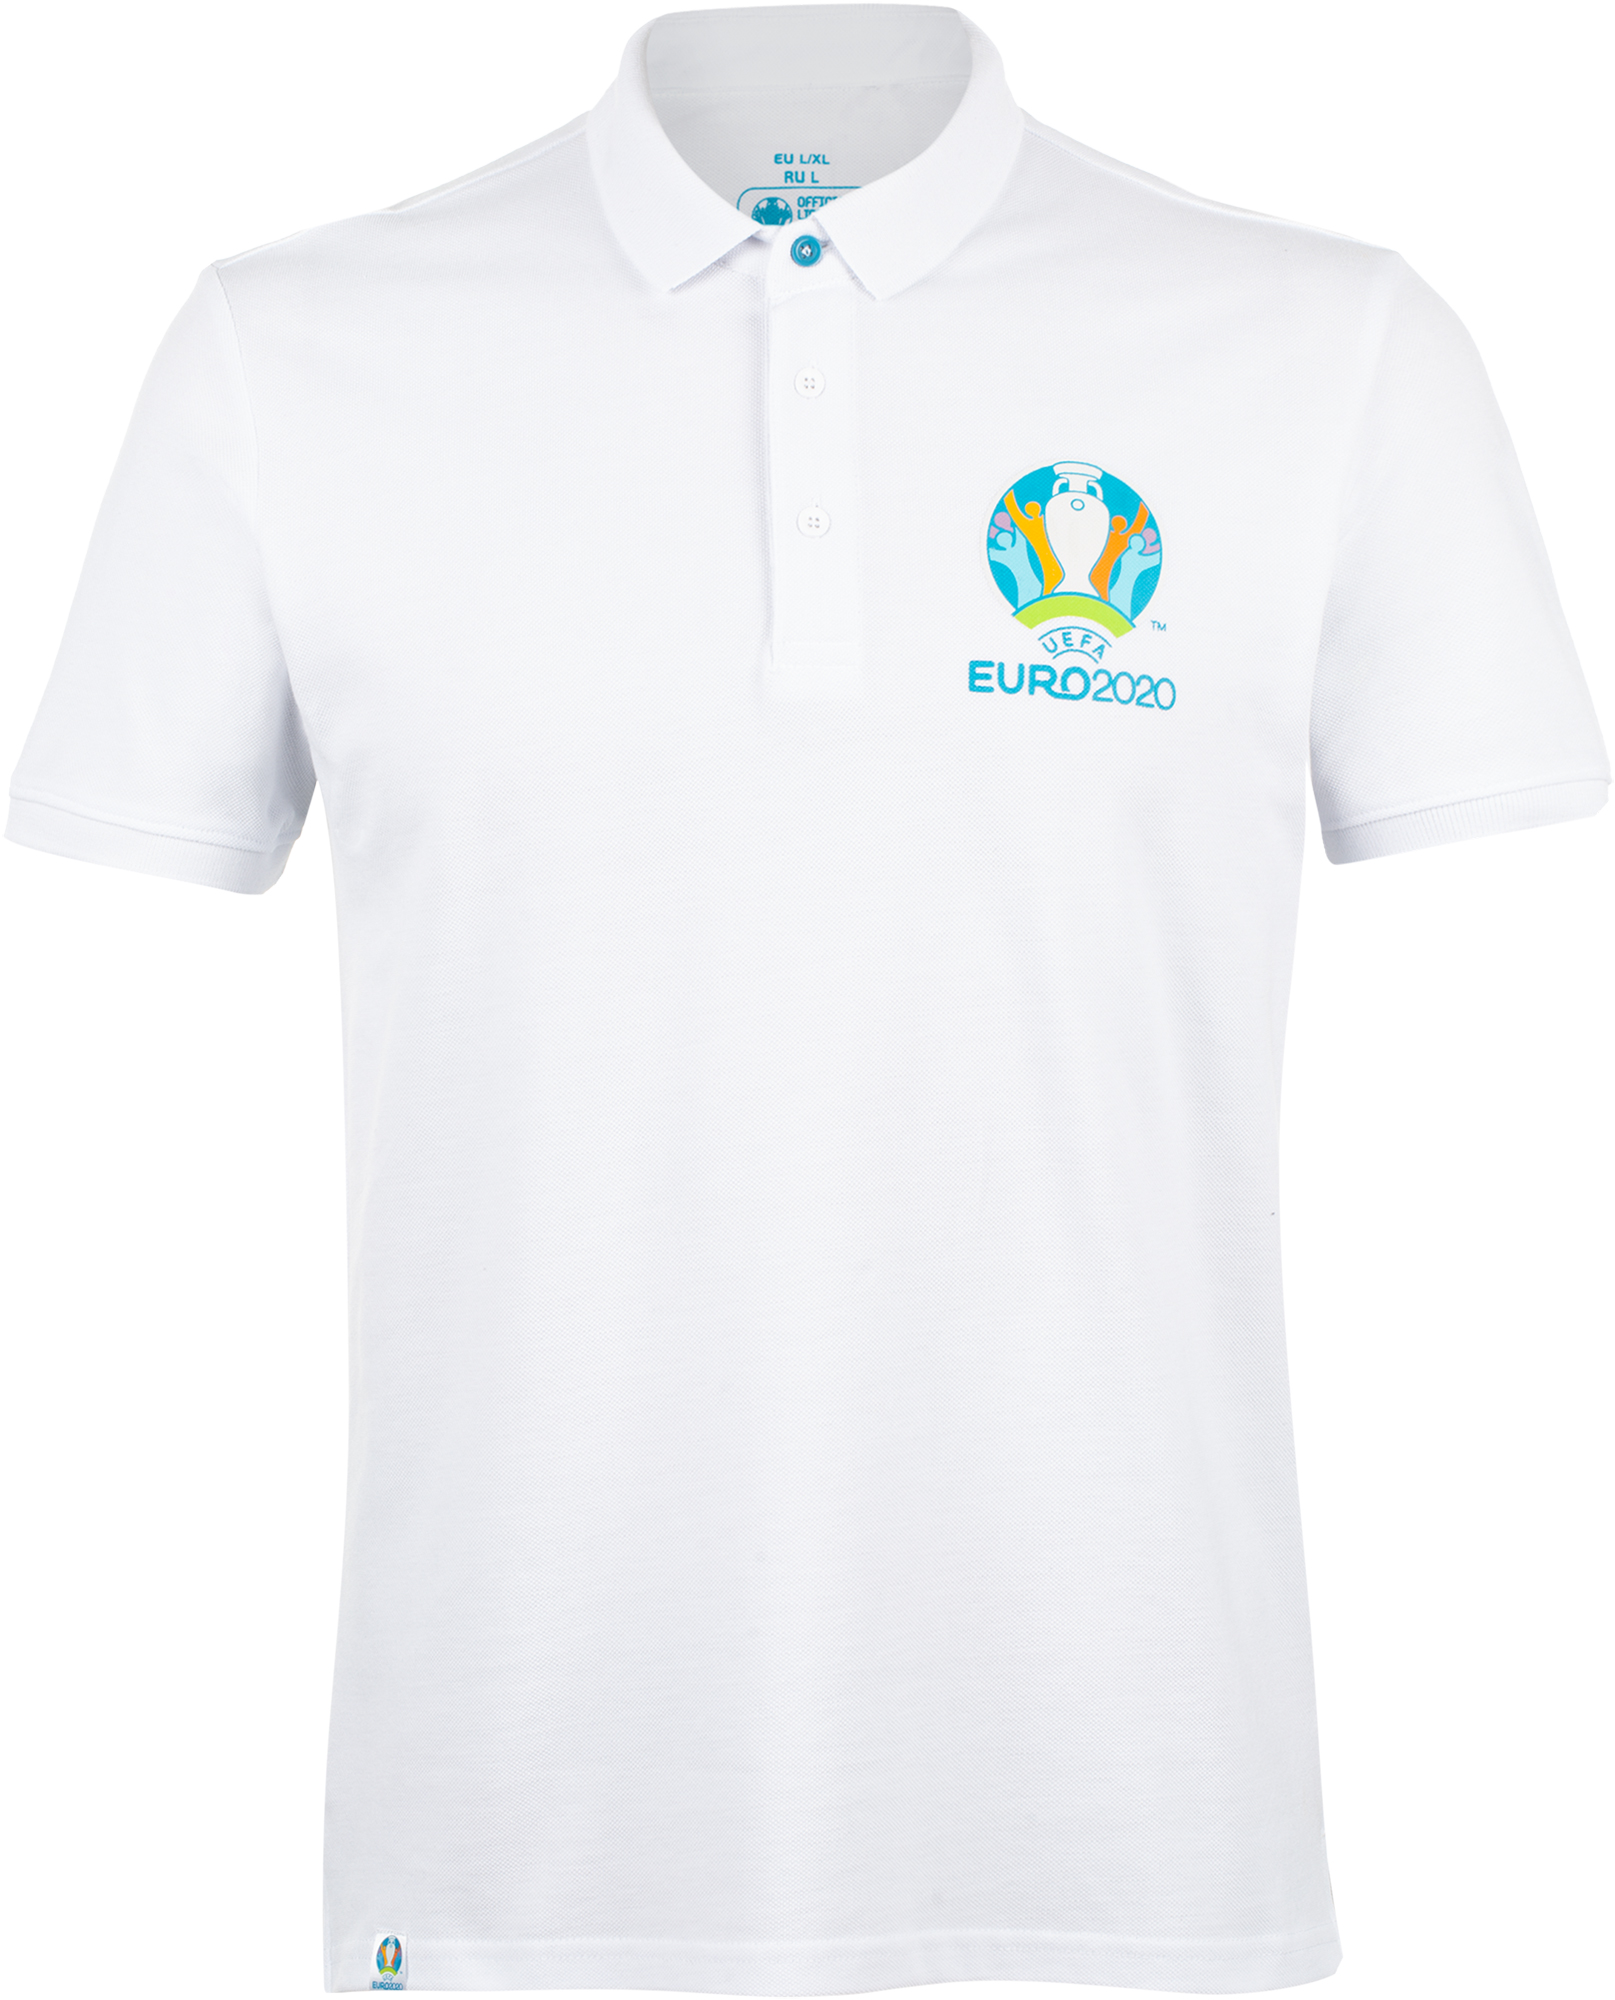 UEFA Поло мужское EURO 2020, размер 54